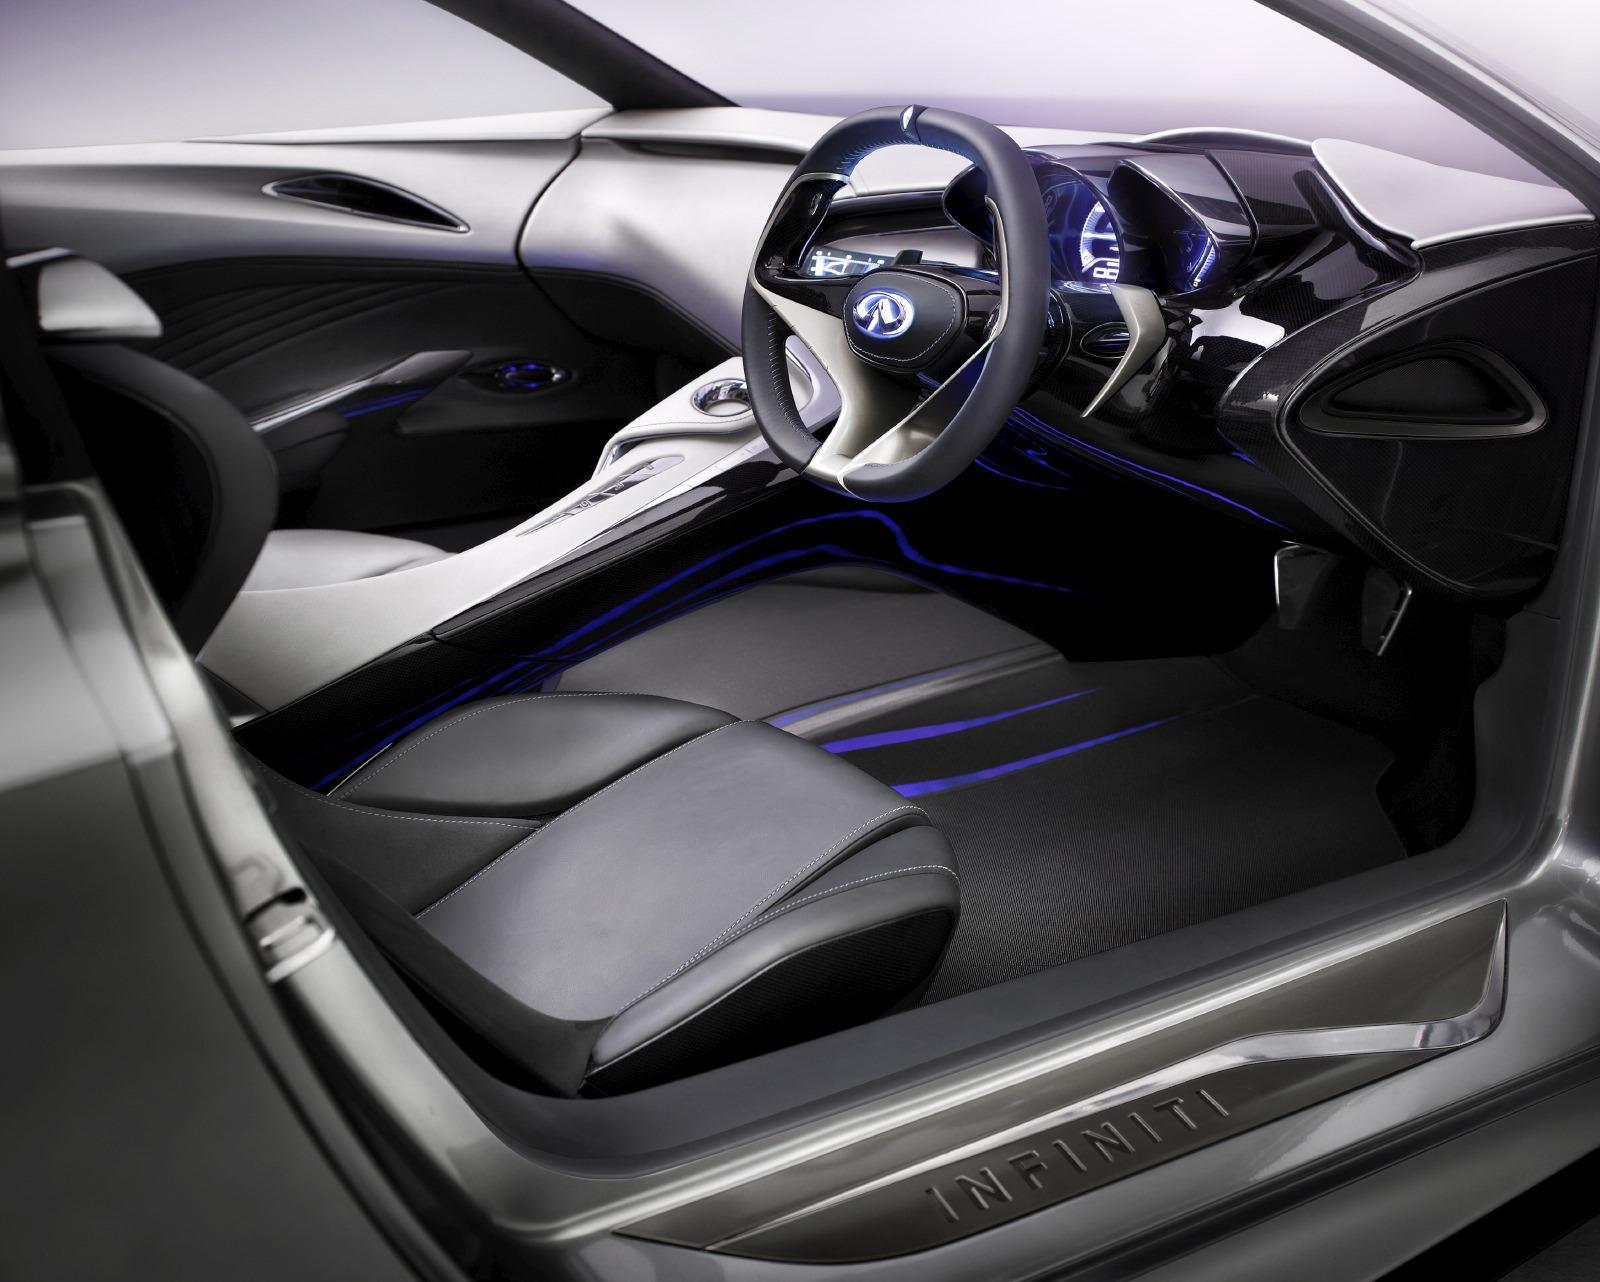 Electric Vehicle News: February 2012